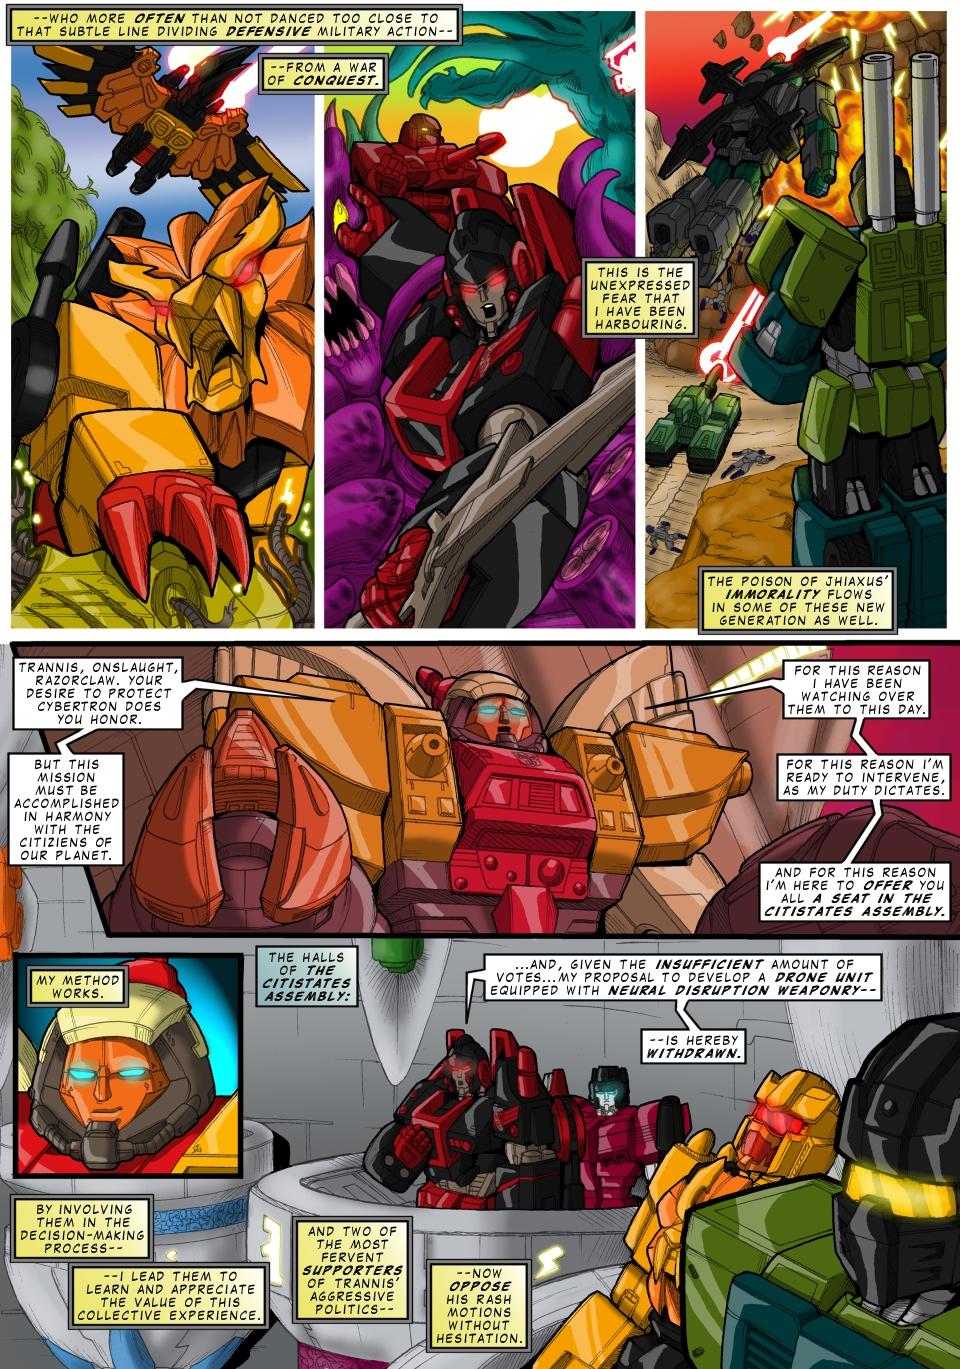 01 Omega Supreme - page 14 by Tf-SeedsOfDeception